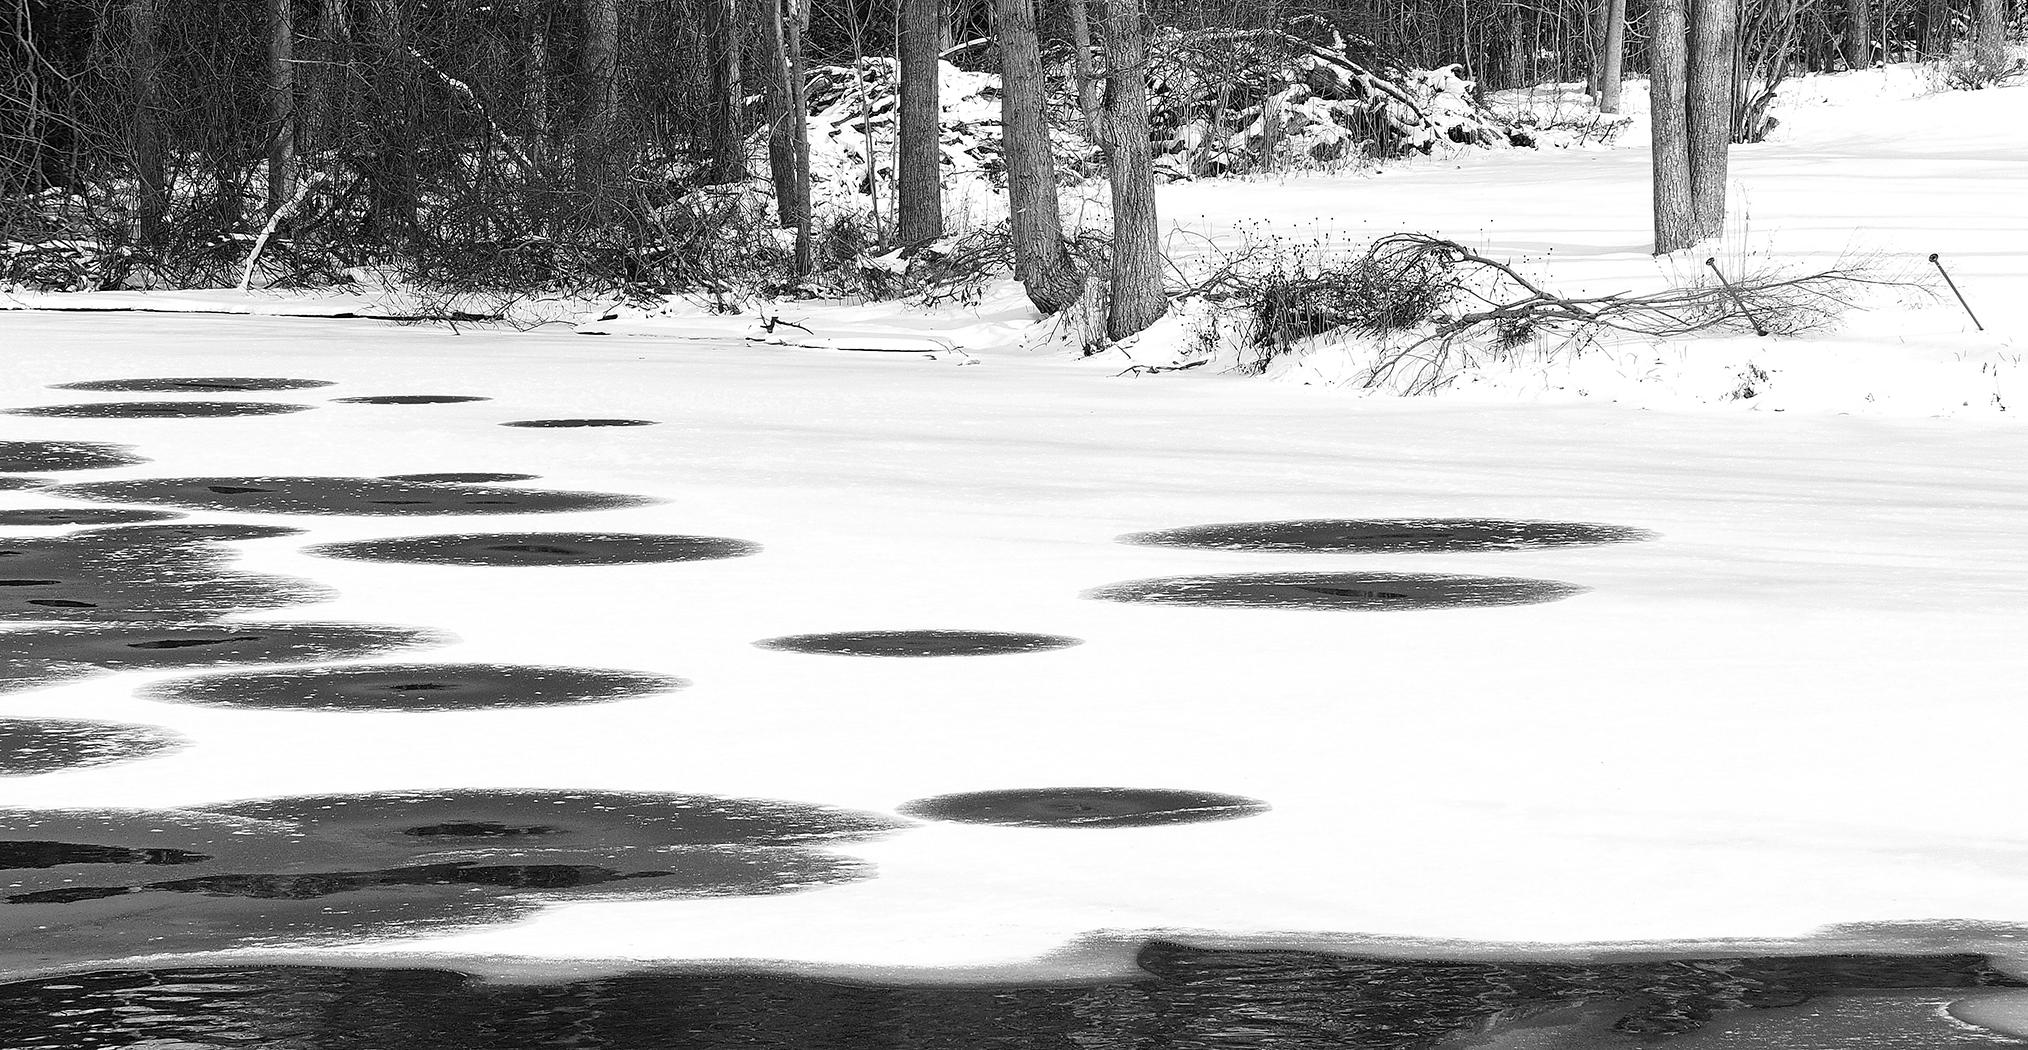 Jedburgh Pond, Ayr - Circles of melting ice-Black and White photography